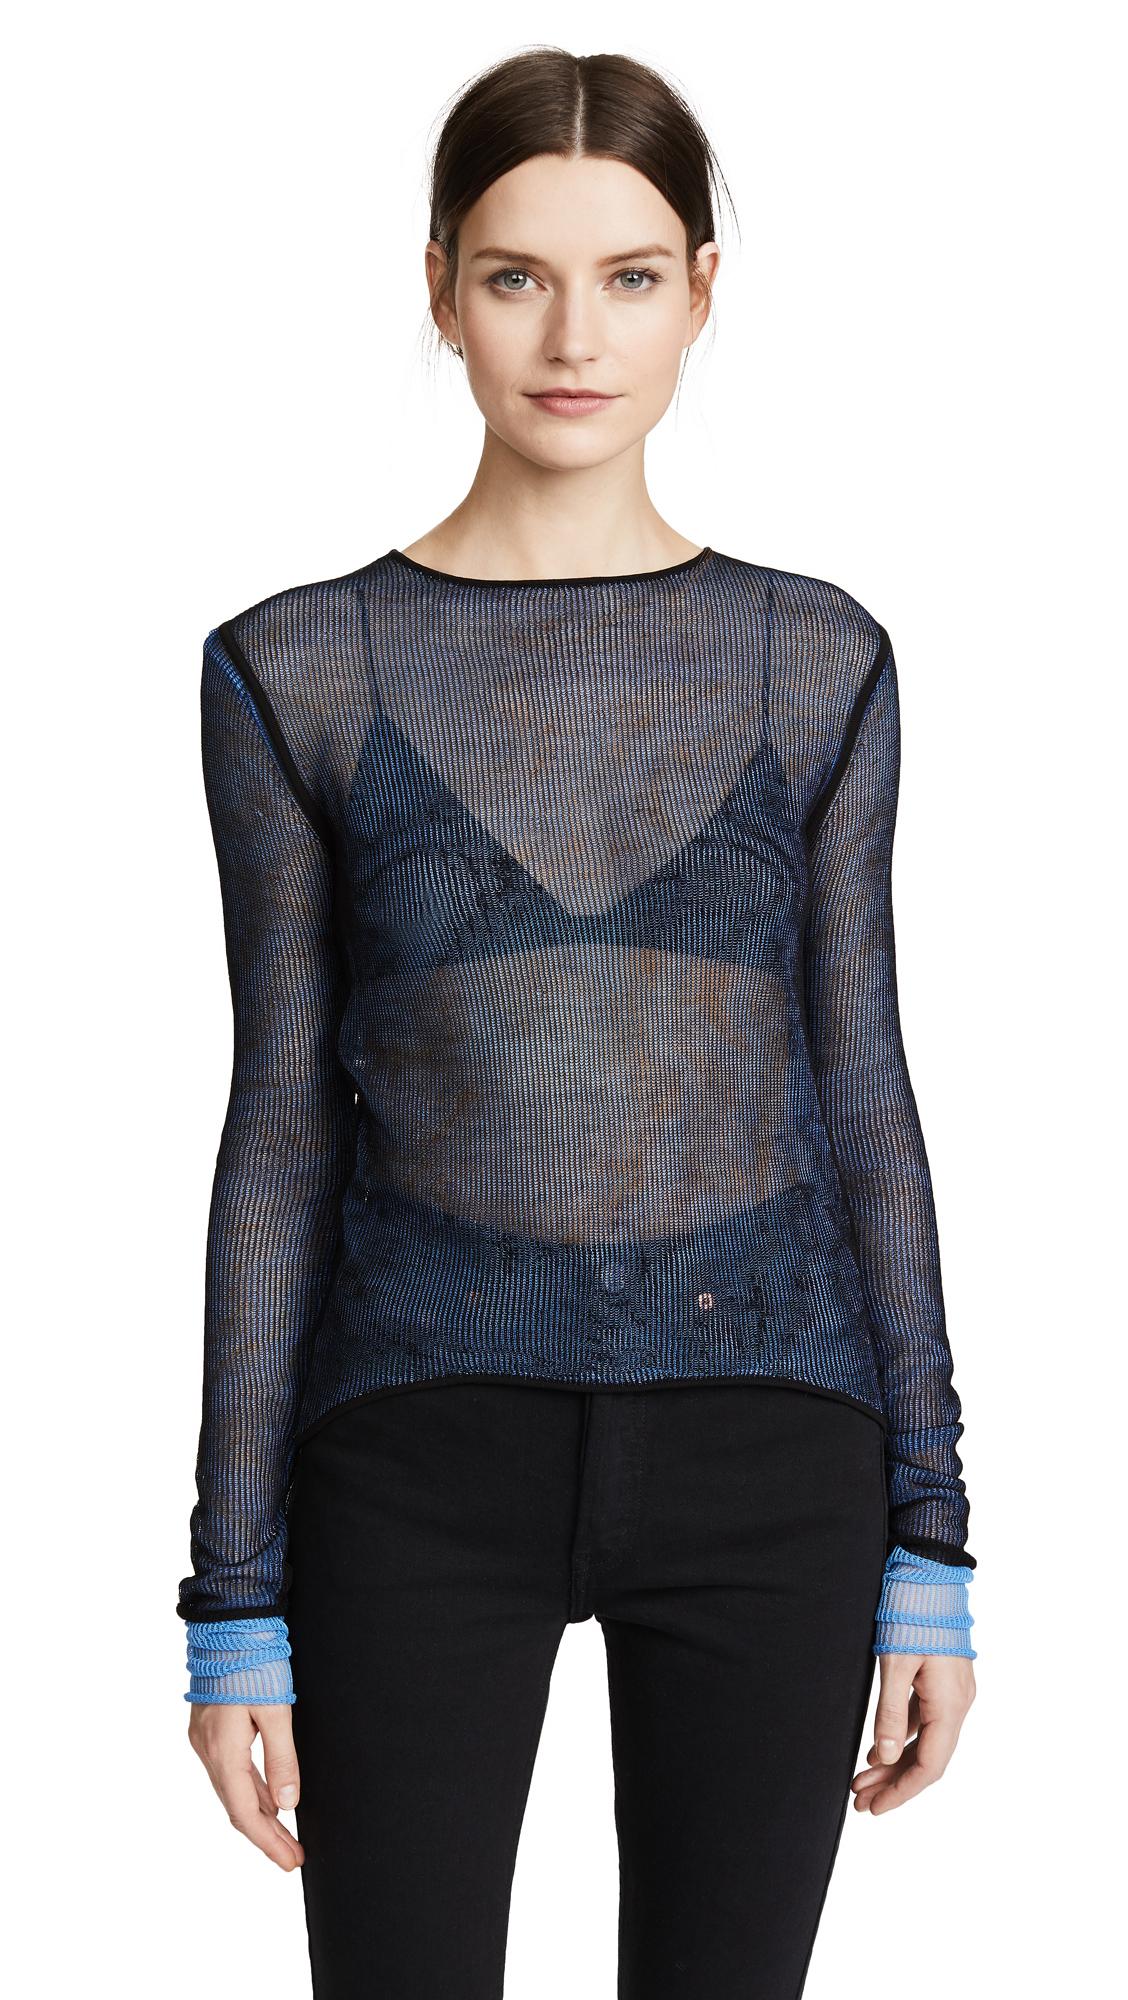 Helmut Lang Sheer Pullover - Black/Plastic Blue